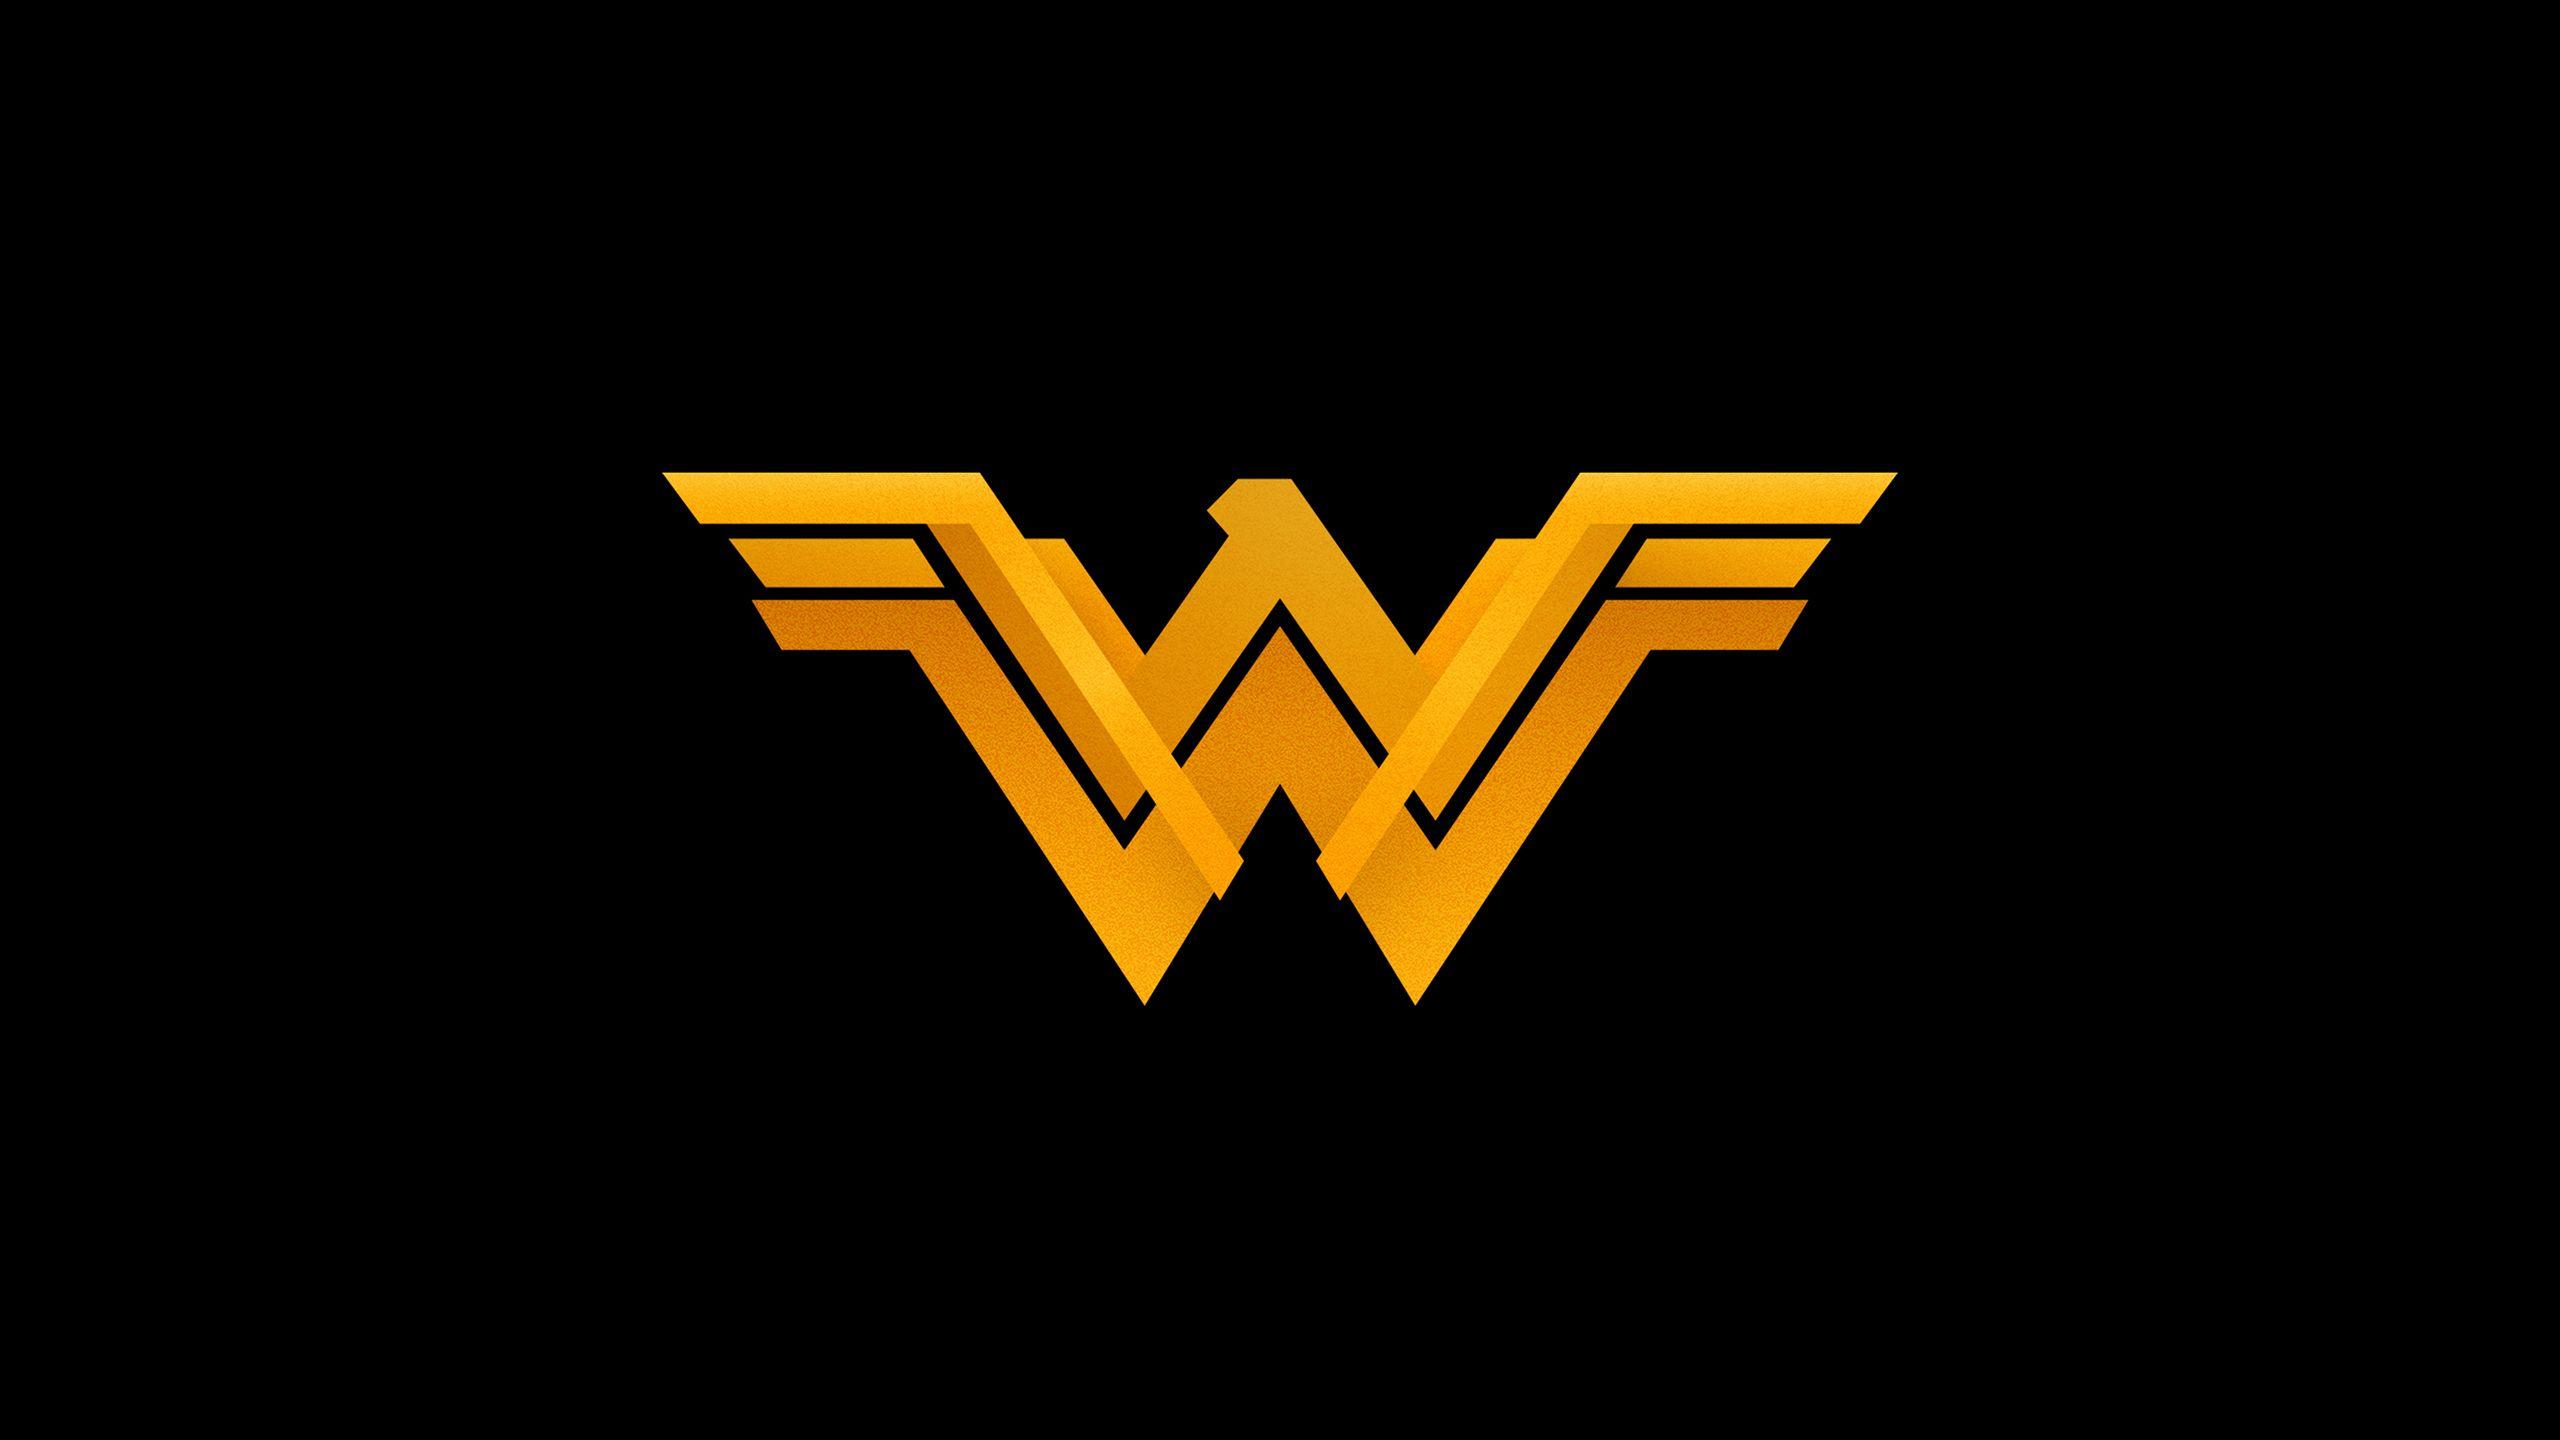 Wonder Woman Logo Wallpapers.